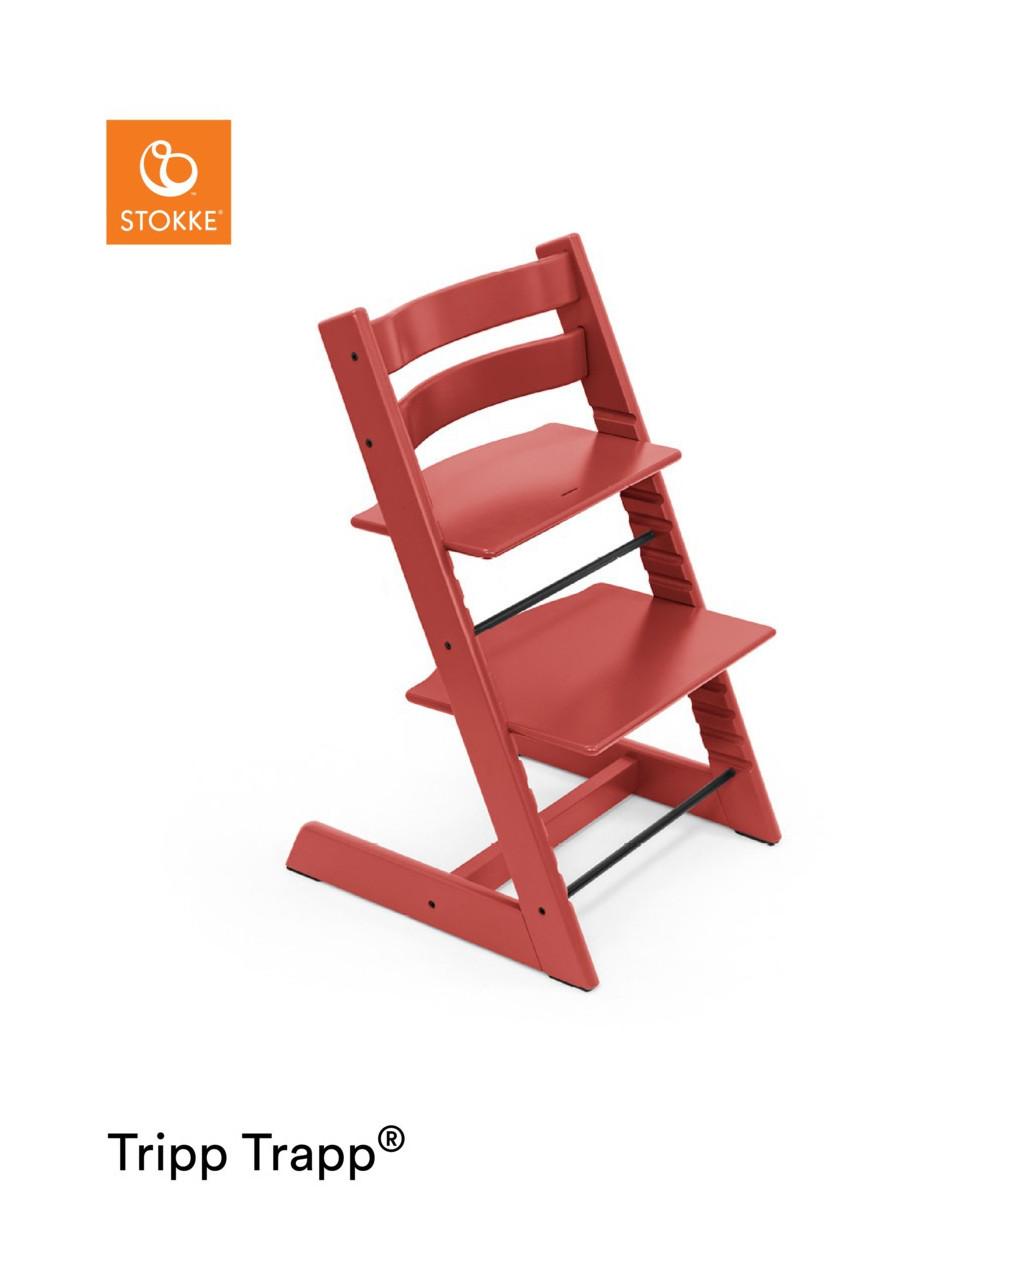 Tripp trapp® - vermelho quente - Stokke